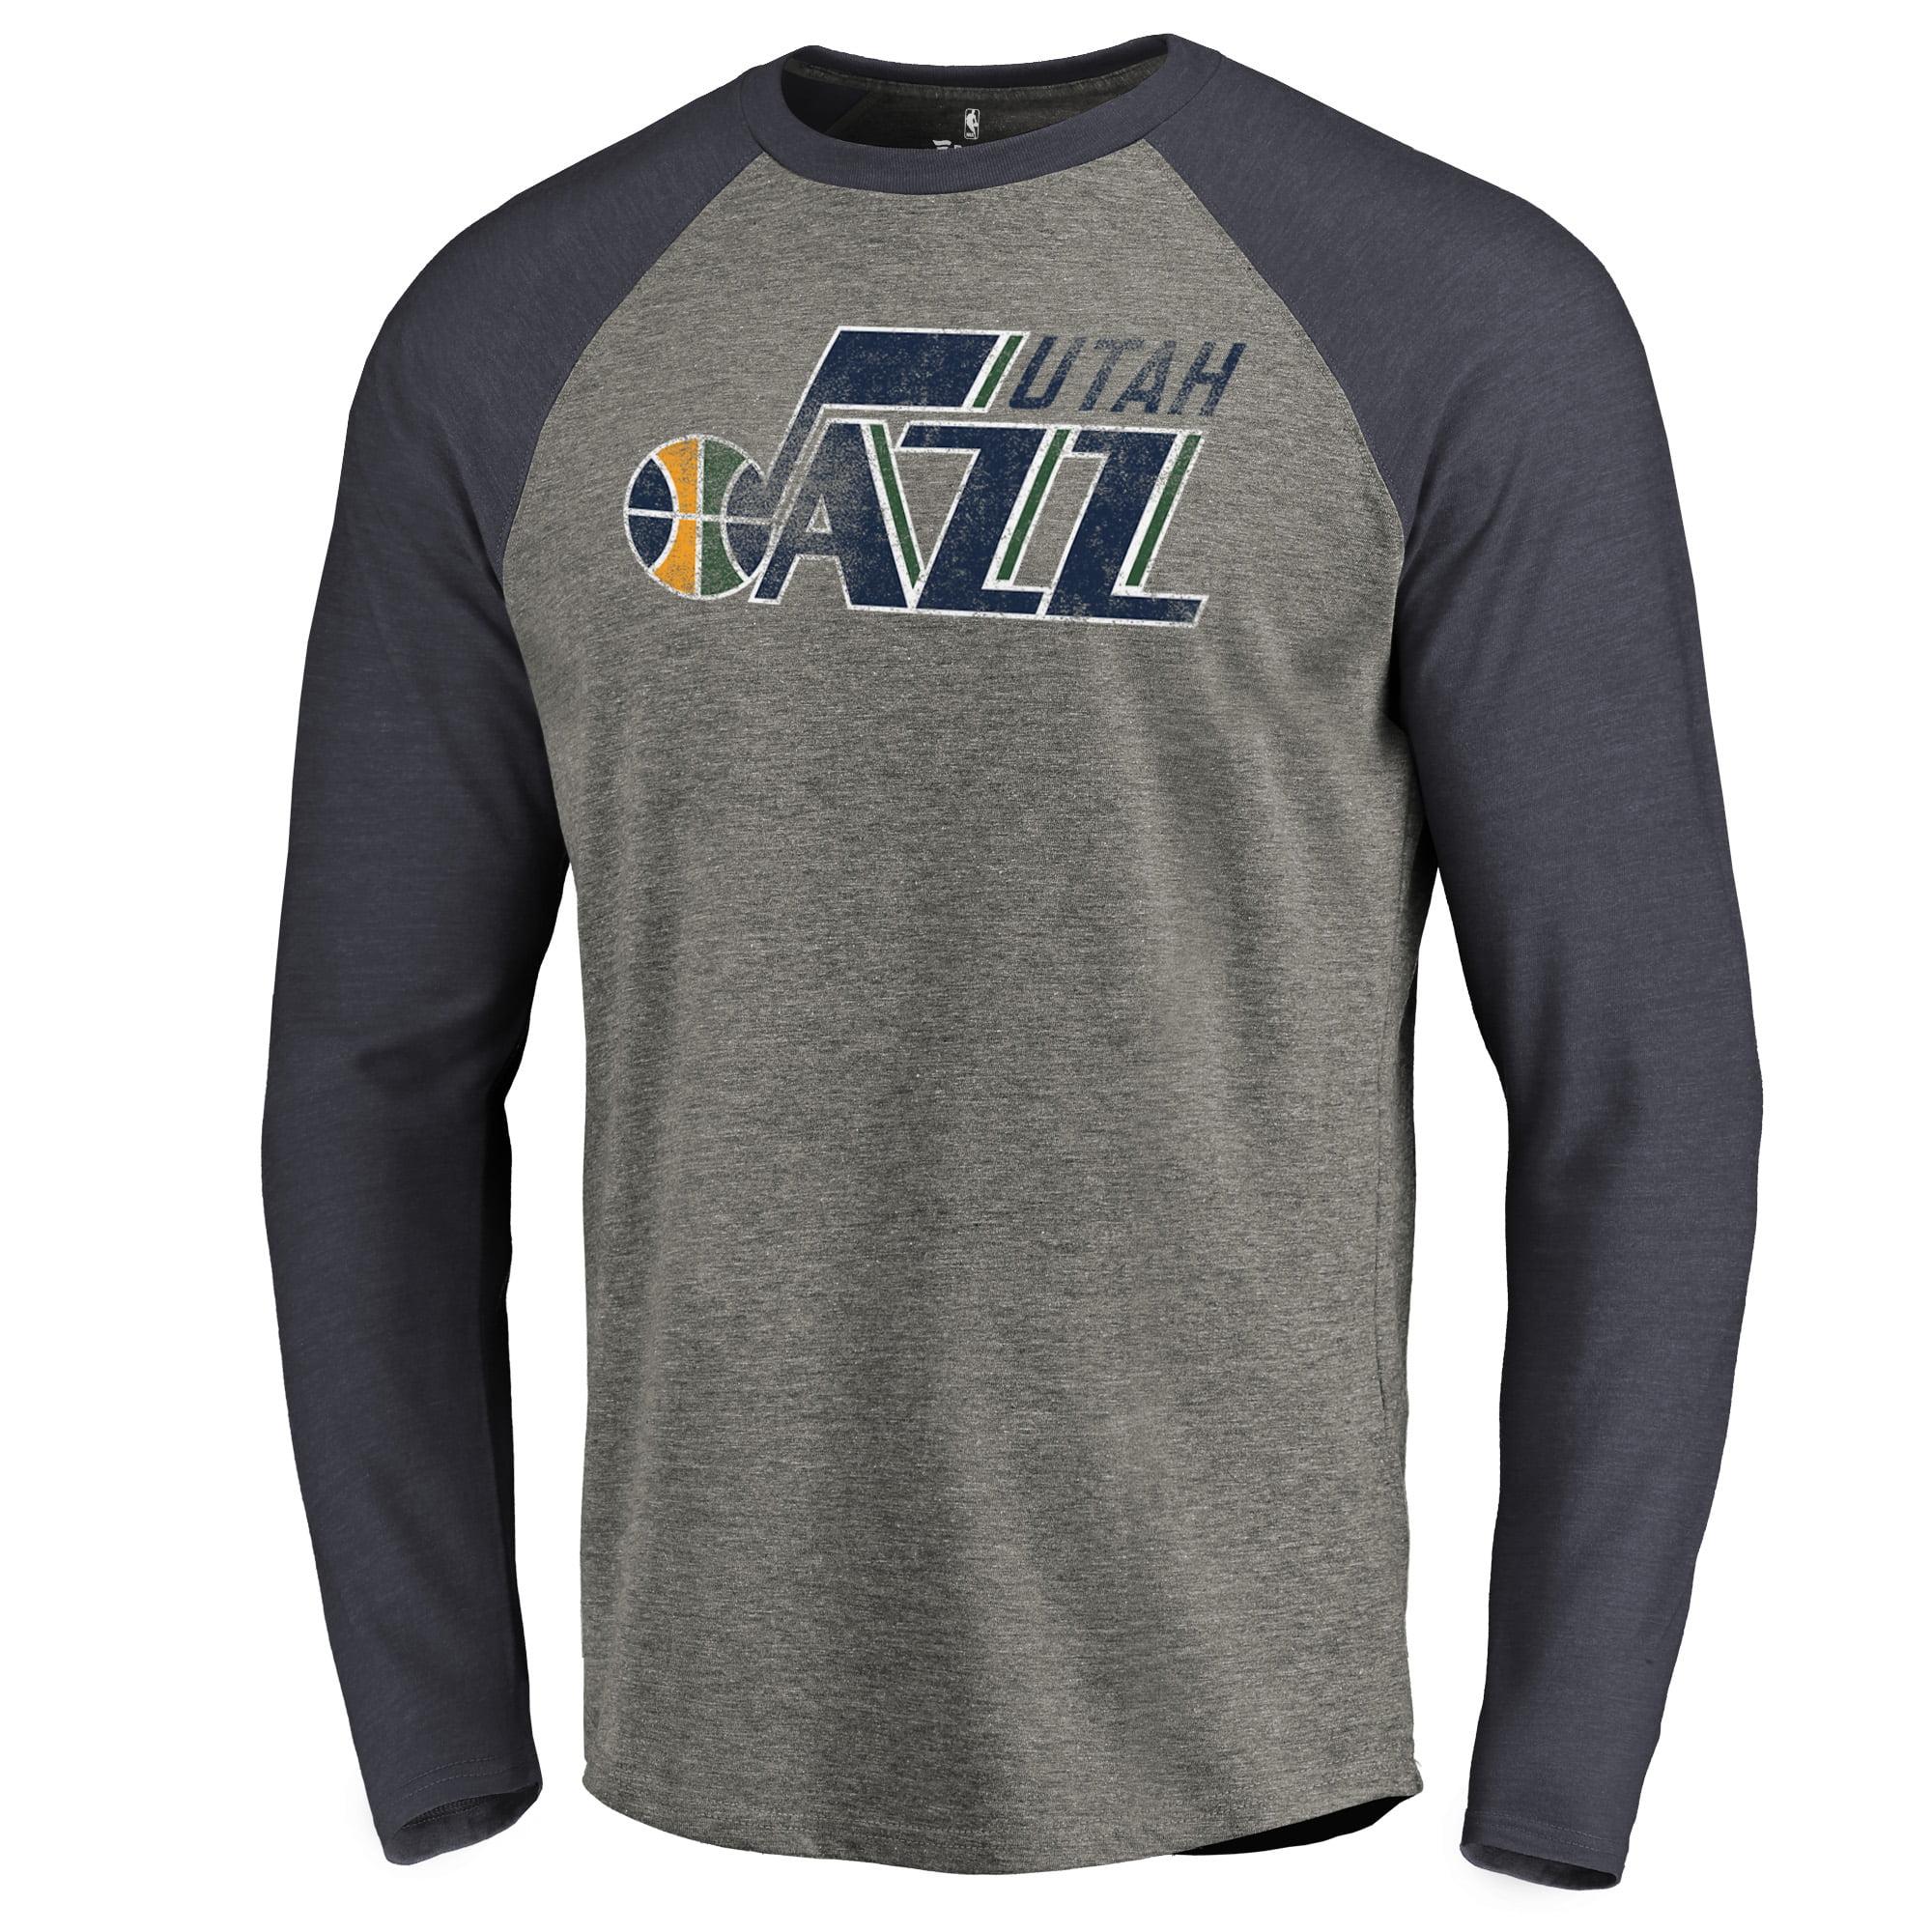 757a2030ad9d Utah Jazz Fanatics Branded Distressed Logo Tri-Blend Raglan Long Sleeve T- Shirt - Ash Navy